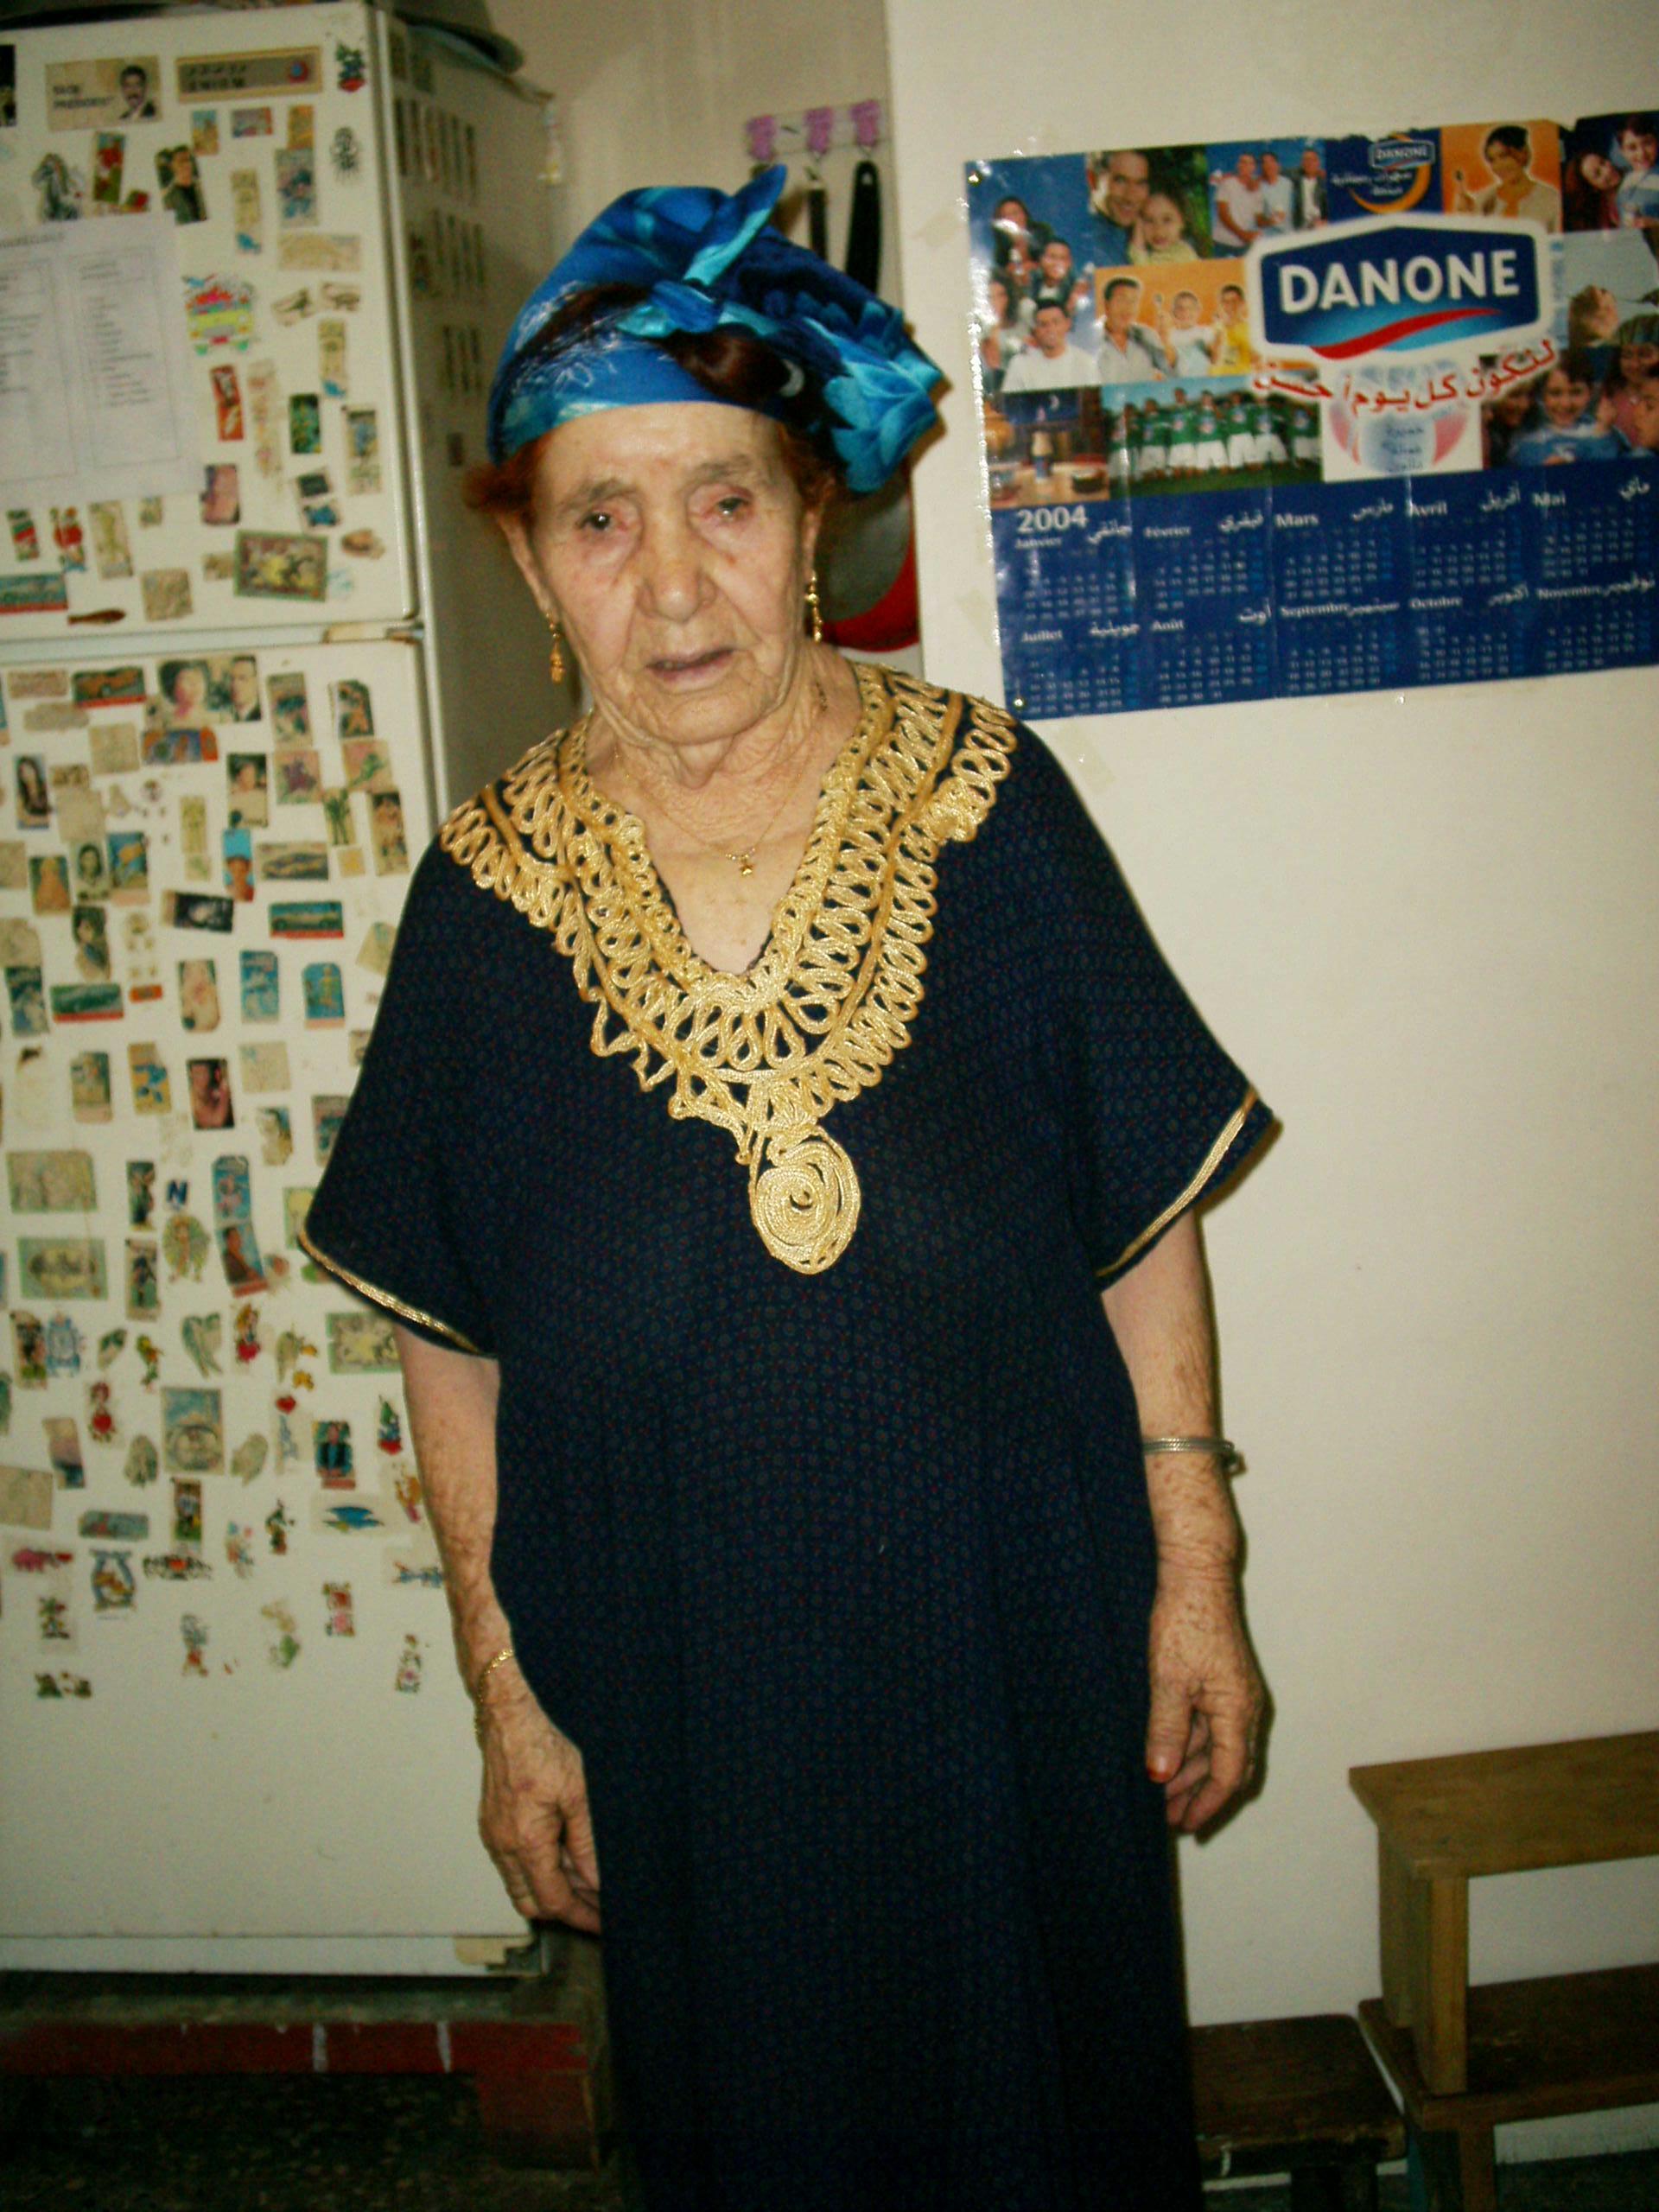 kabyle nuekatzenberger nude